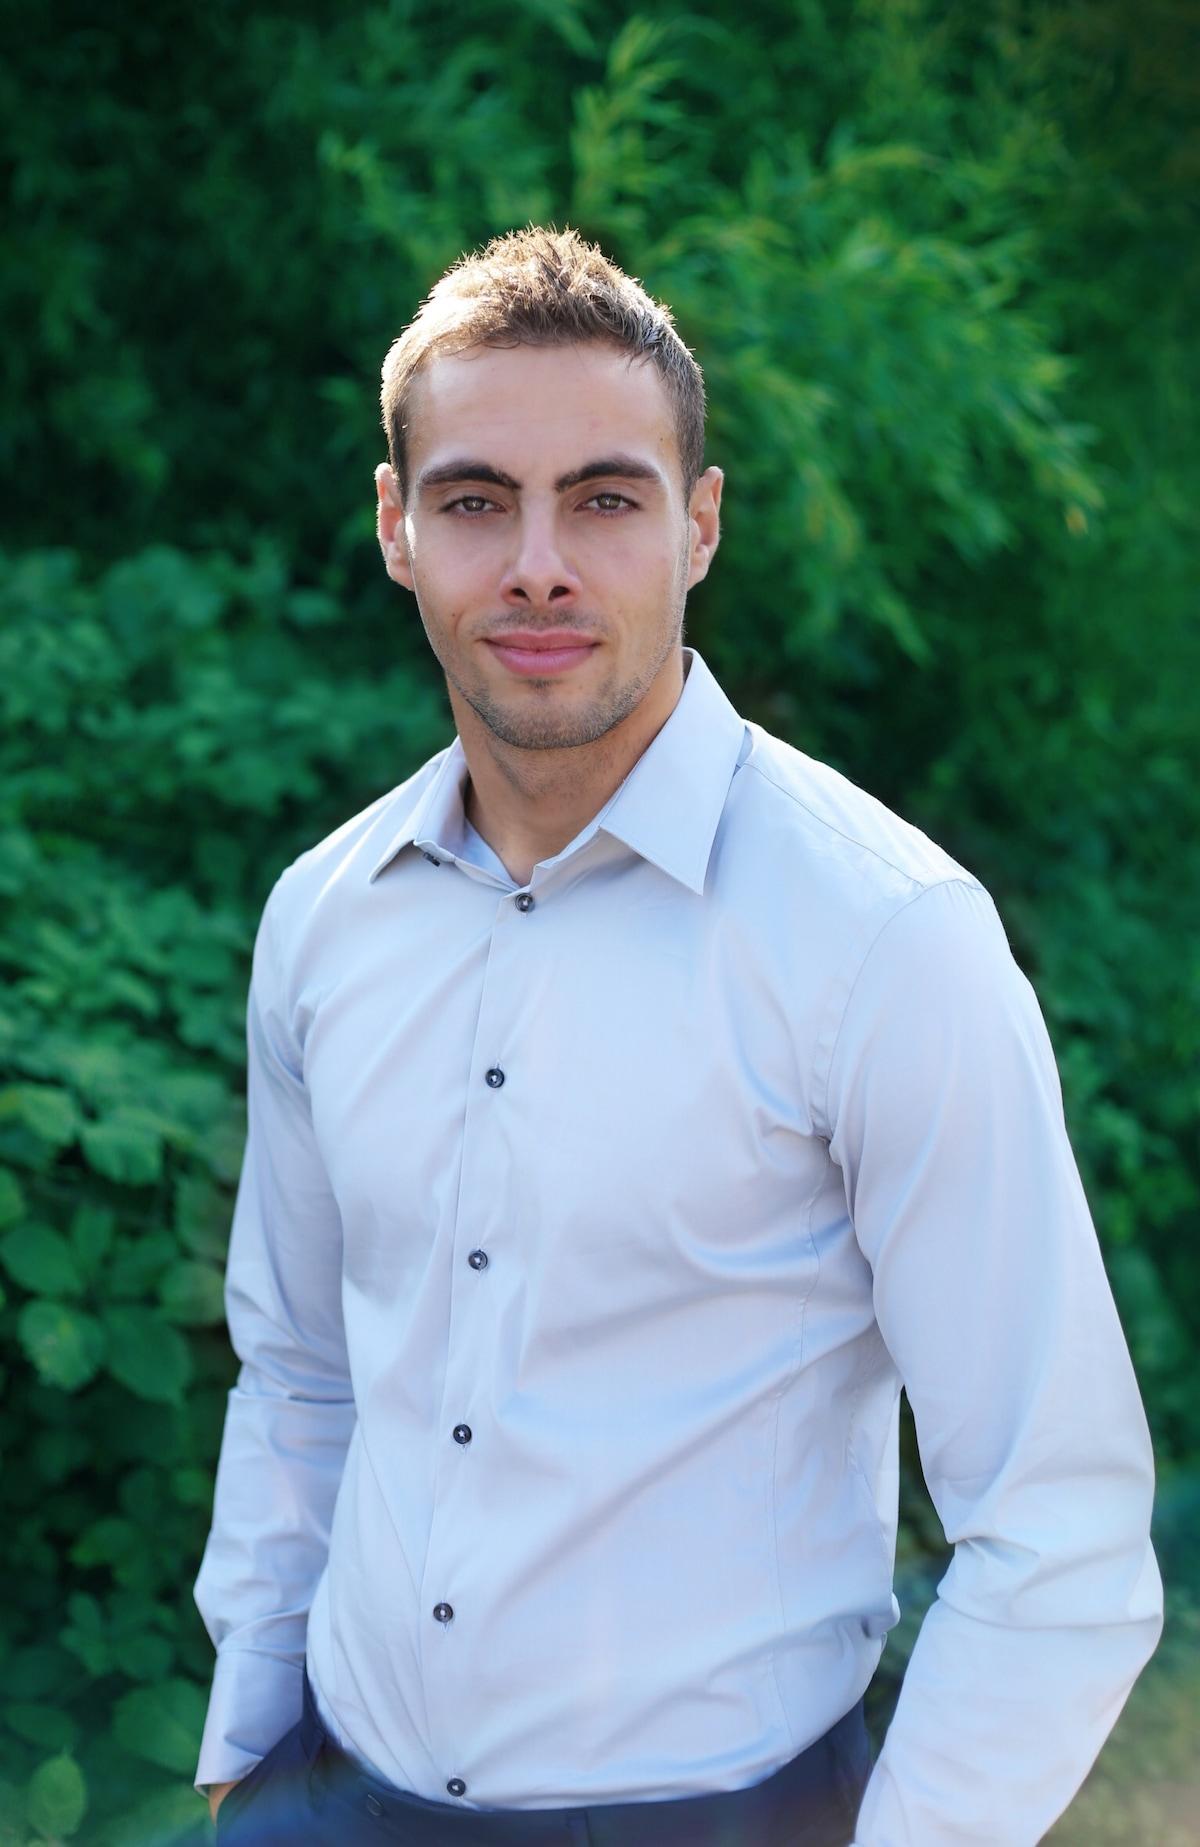 Djamel from Rijswijk